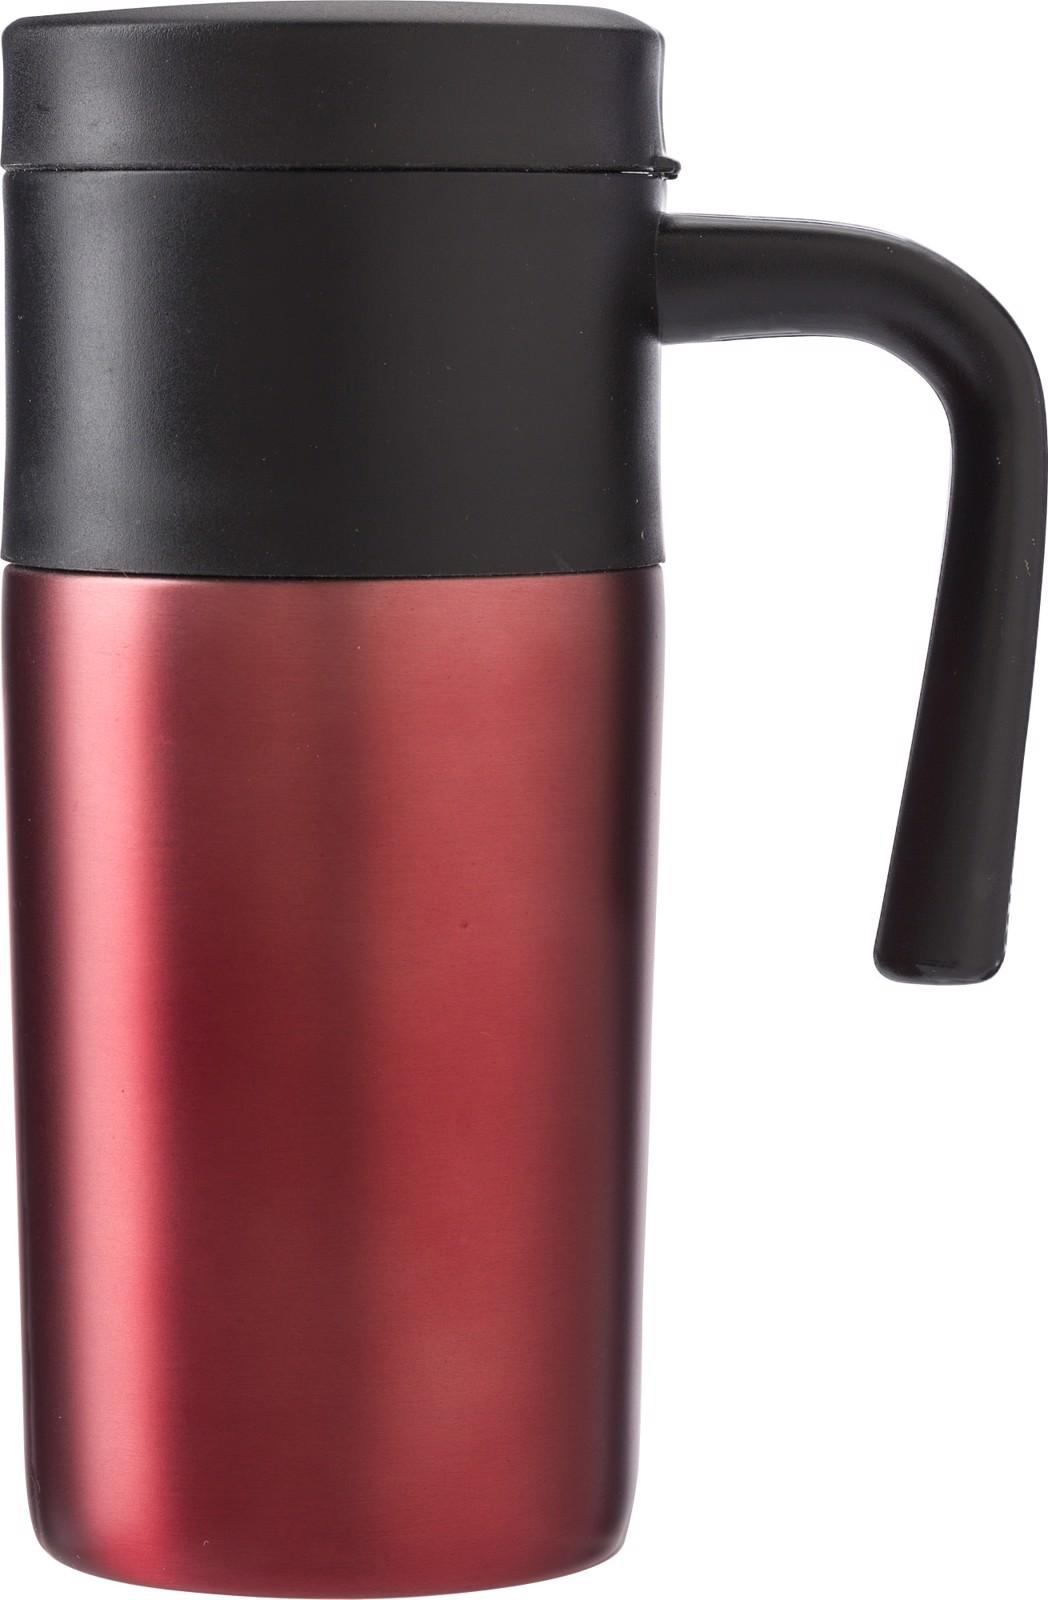 Stainless steel mug - Red